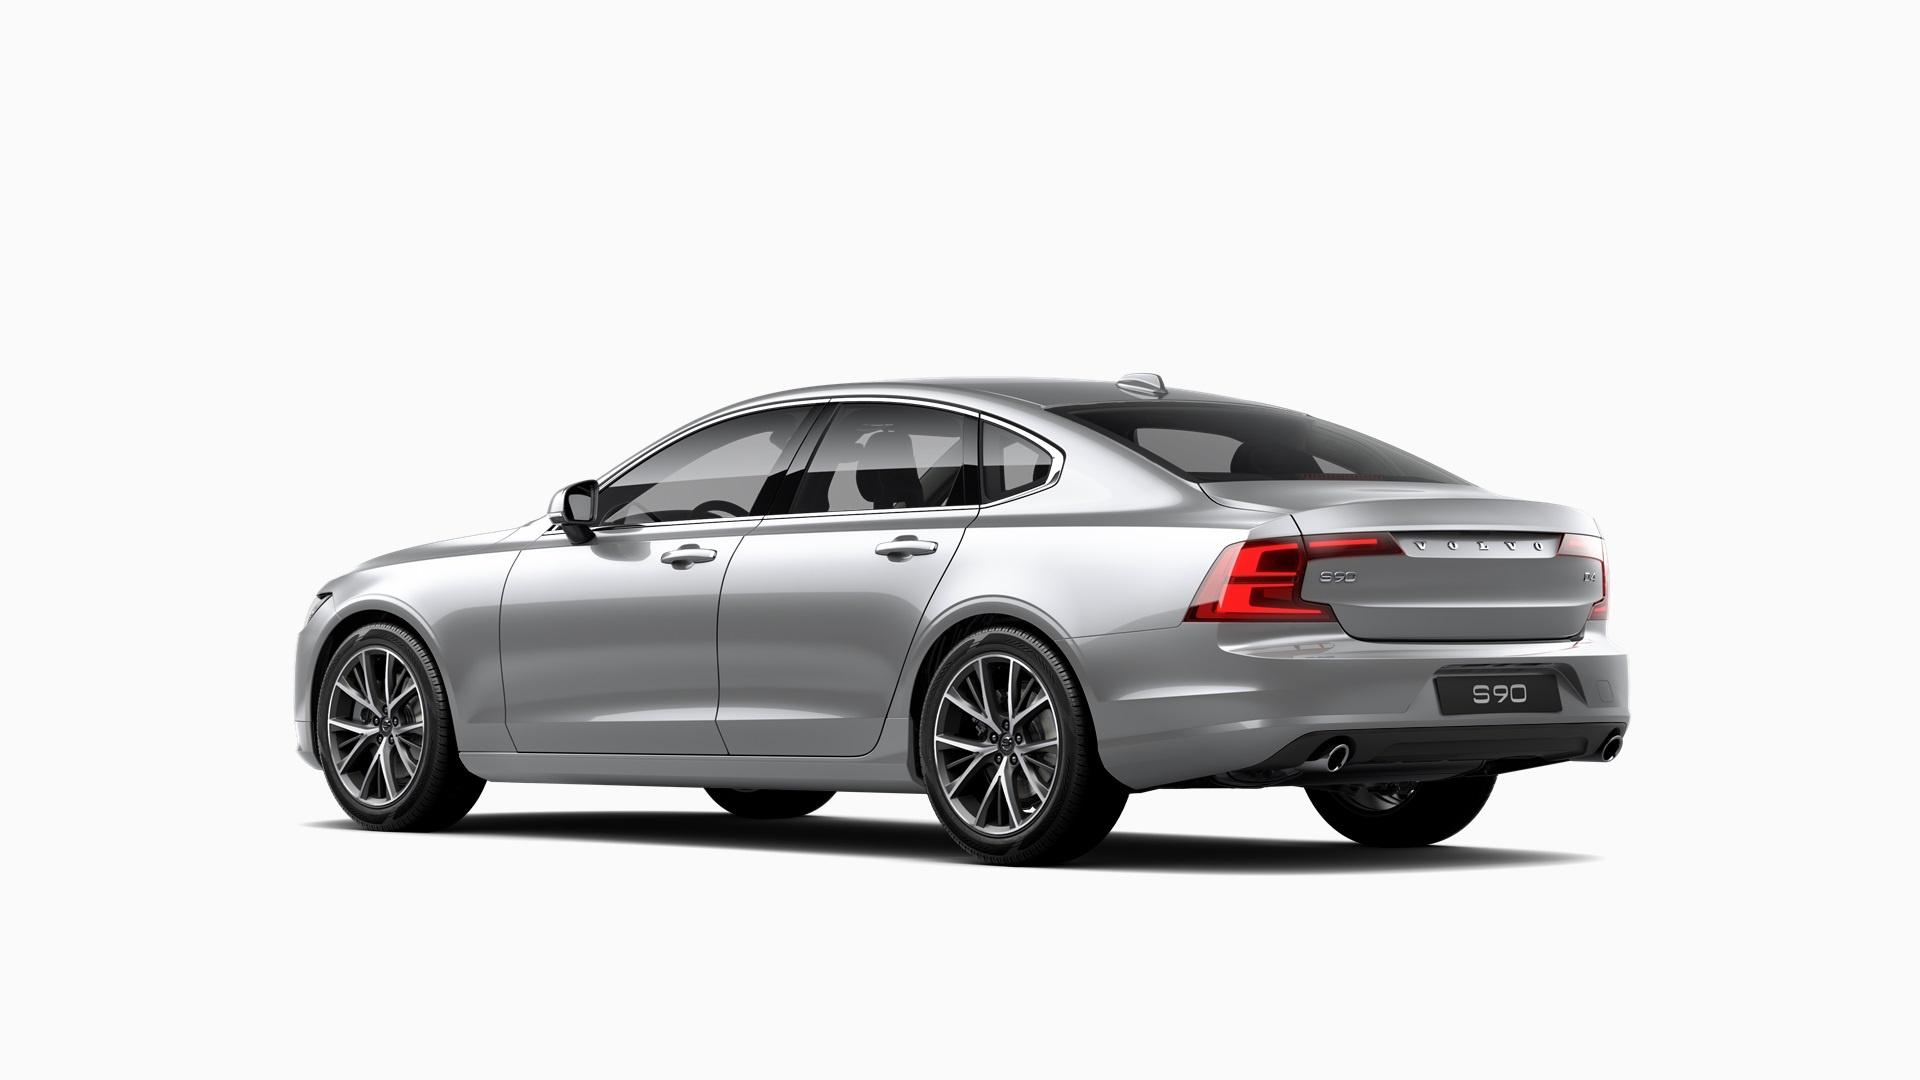 volvo-cars-s90-silver.jpg